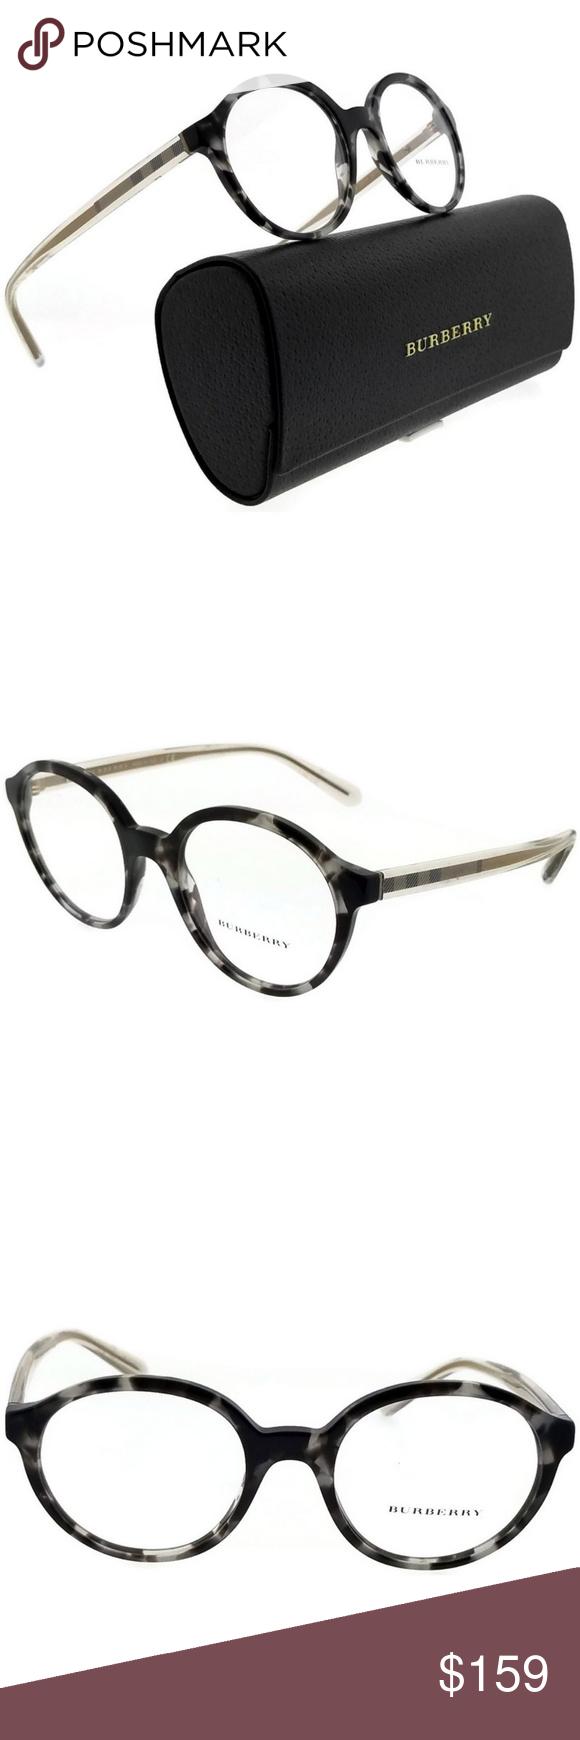 d56d74fd554b BURBERRY BE2254-3533-49 EYEGLASSES New gorgeous authentic Burberry  BE2254-3533-49 round women s havana frame clear lens 49mm eyeglass…